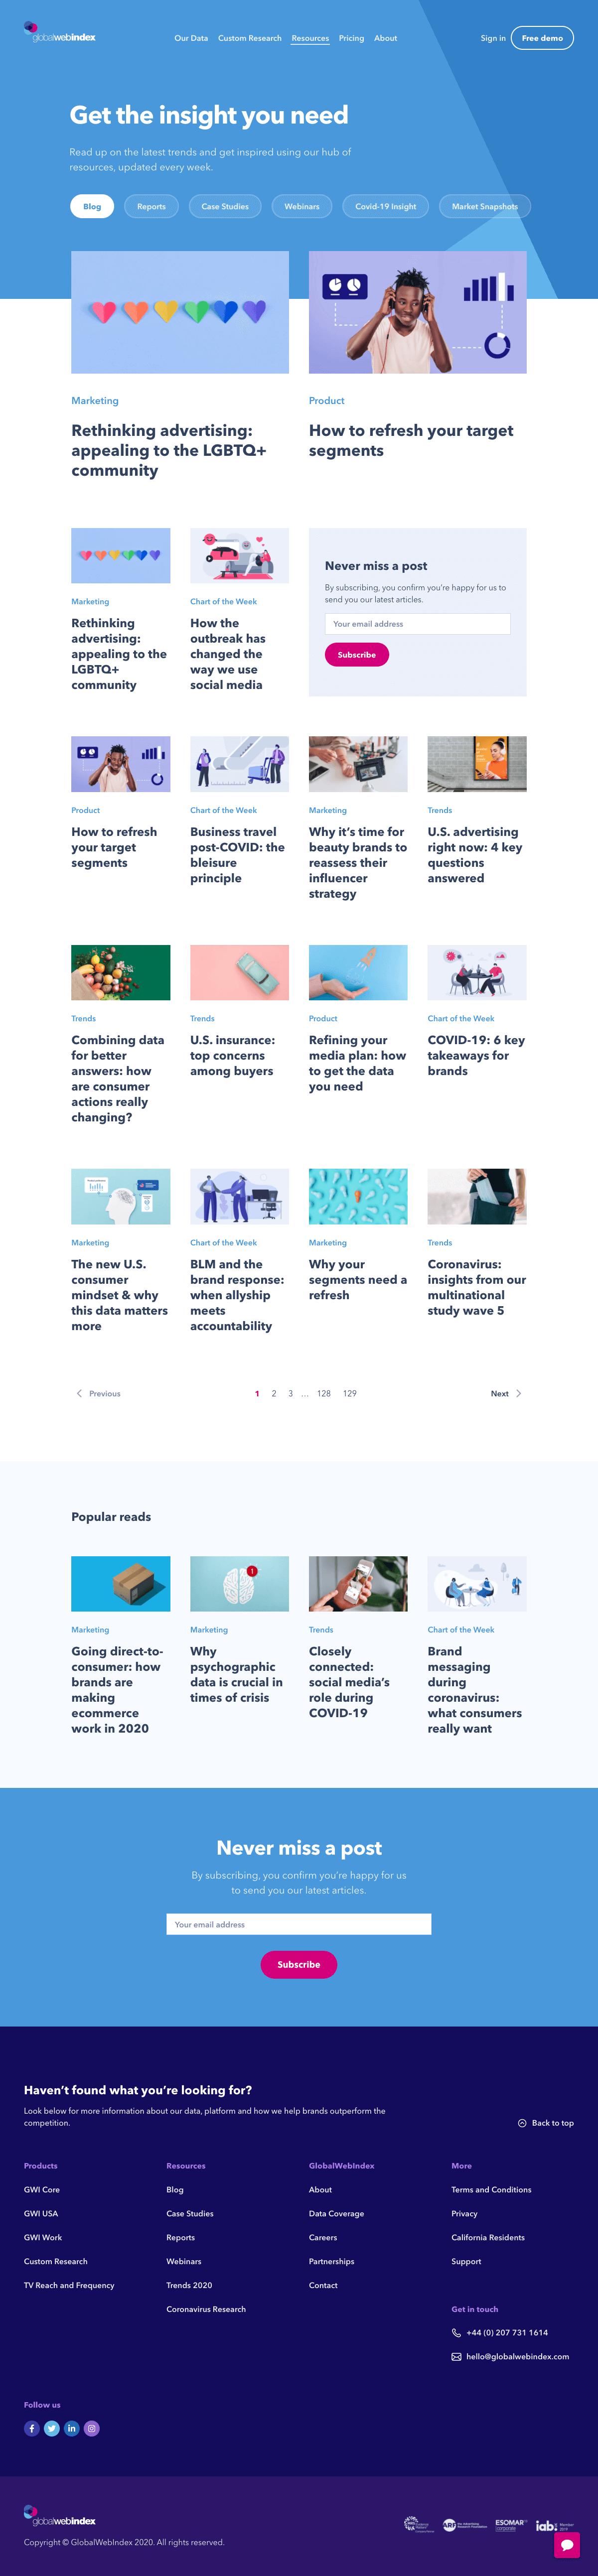 GlobalWebIndex – Blog Index